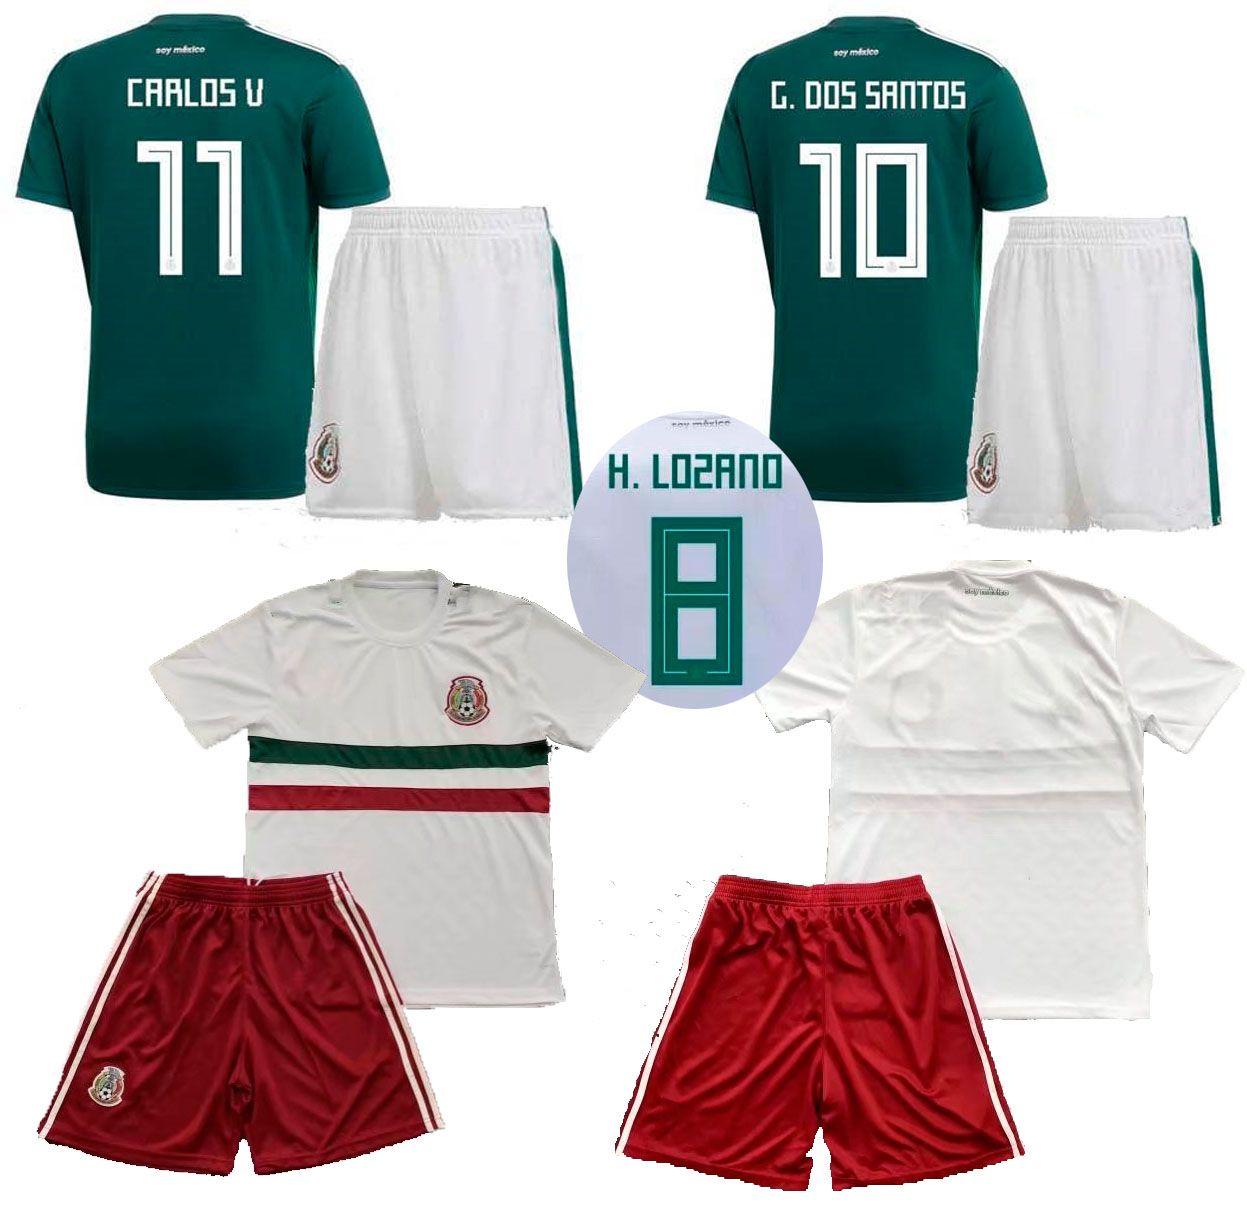 8b896cbea34 2019 2018 Mexico Home Green Soccer Jerseys Pants Away White Thai Quality  Soccer Sets 18 19CHICHARITO R.JIMENEZ H. LOZANO Football Kits Uniforms From  ...